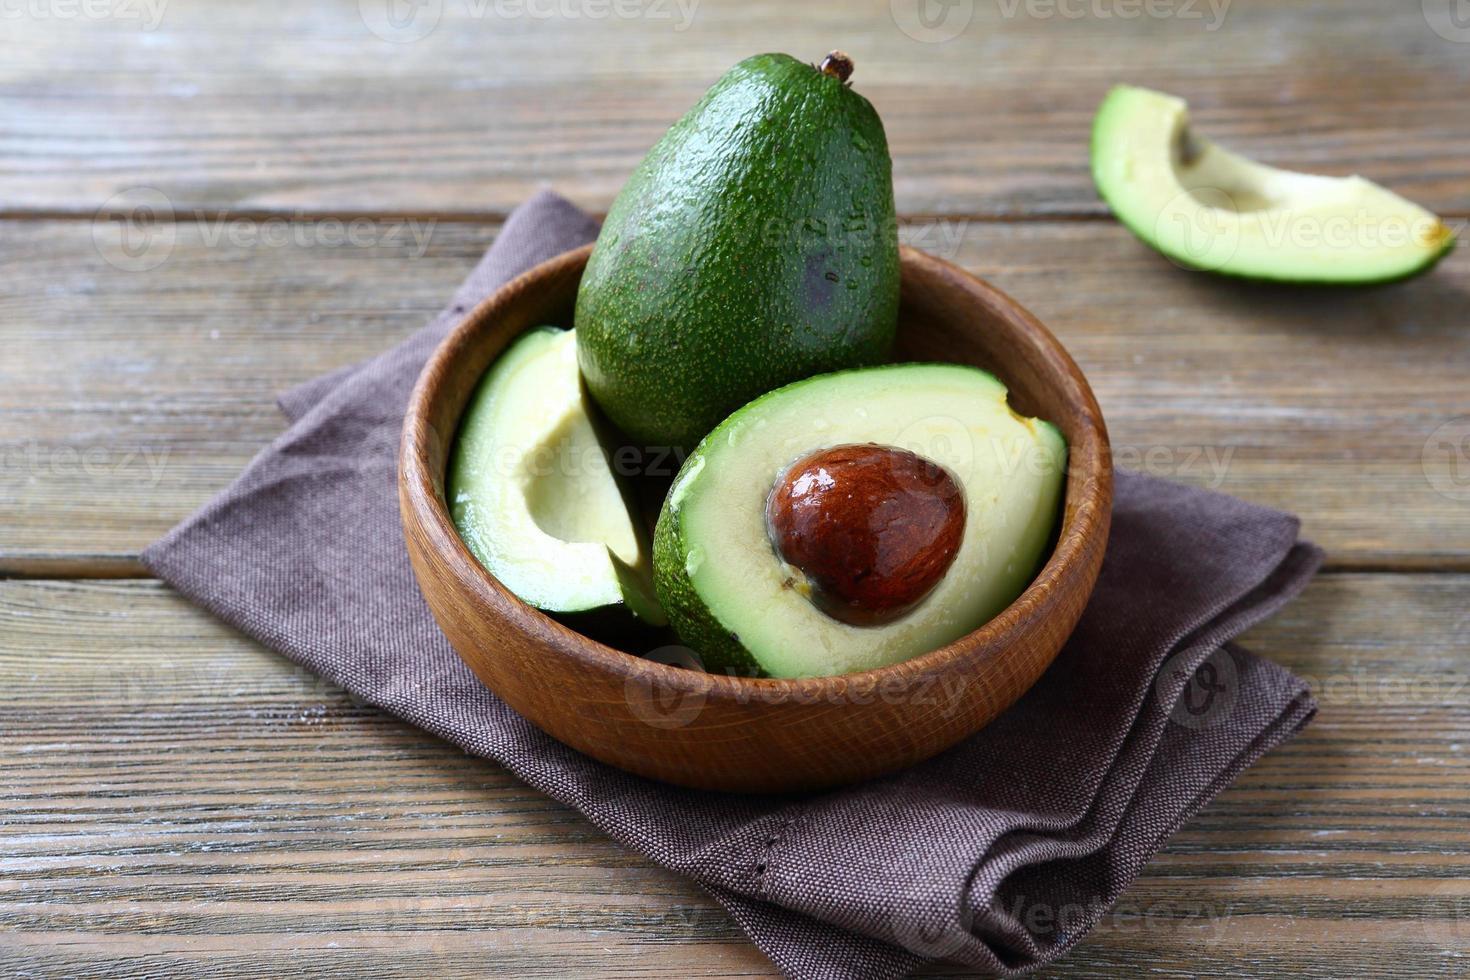 Avocado whole and halves photo